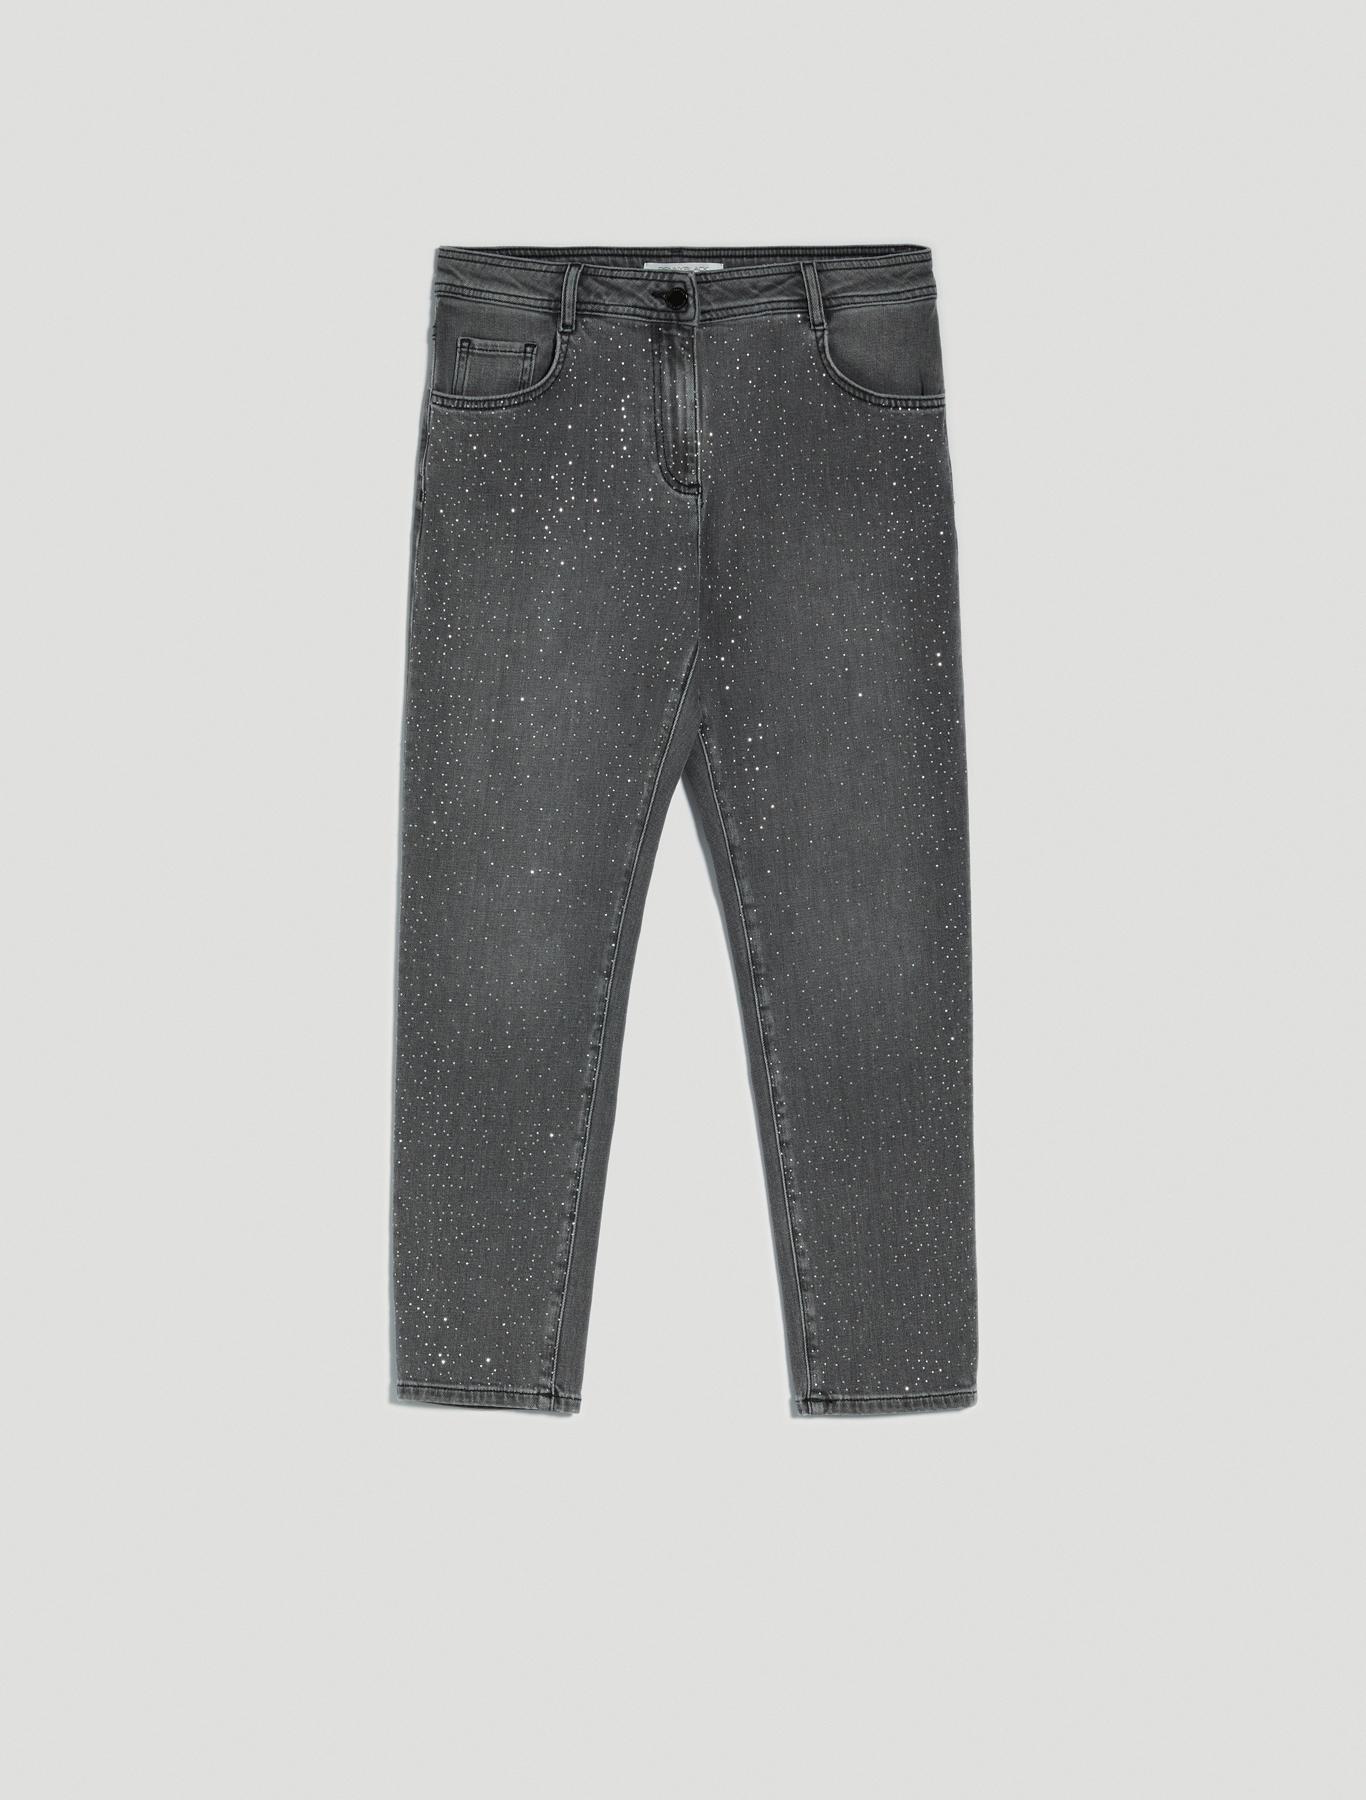 Jeans with micro-rhinestones - black - pennyblack